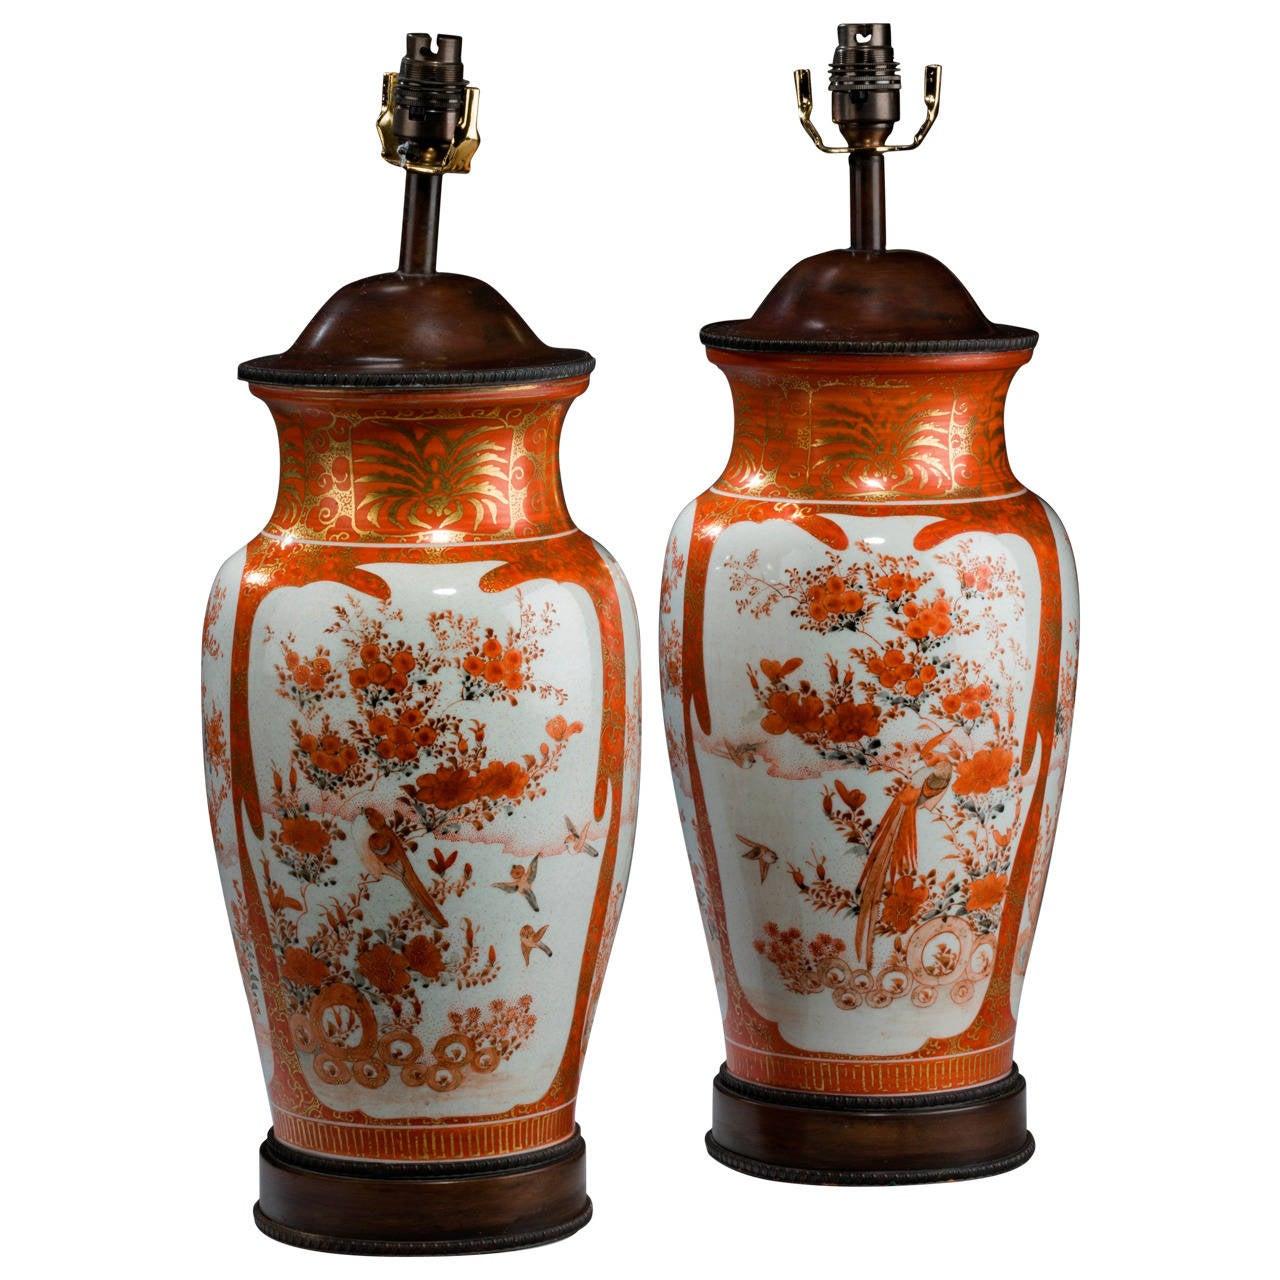 Pair of late 19th century japanese satsuma vase lamps for sale at pair of late 19th century japanese satsuma vase lamps for sale reviewsmspy